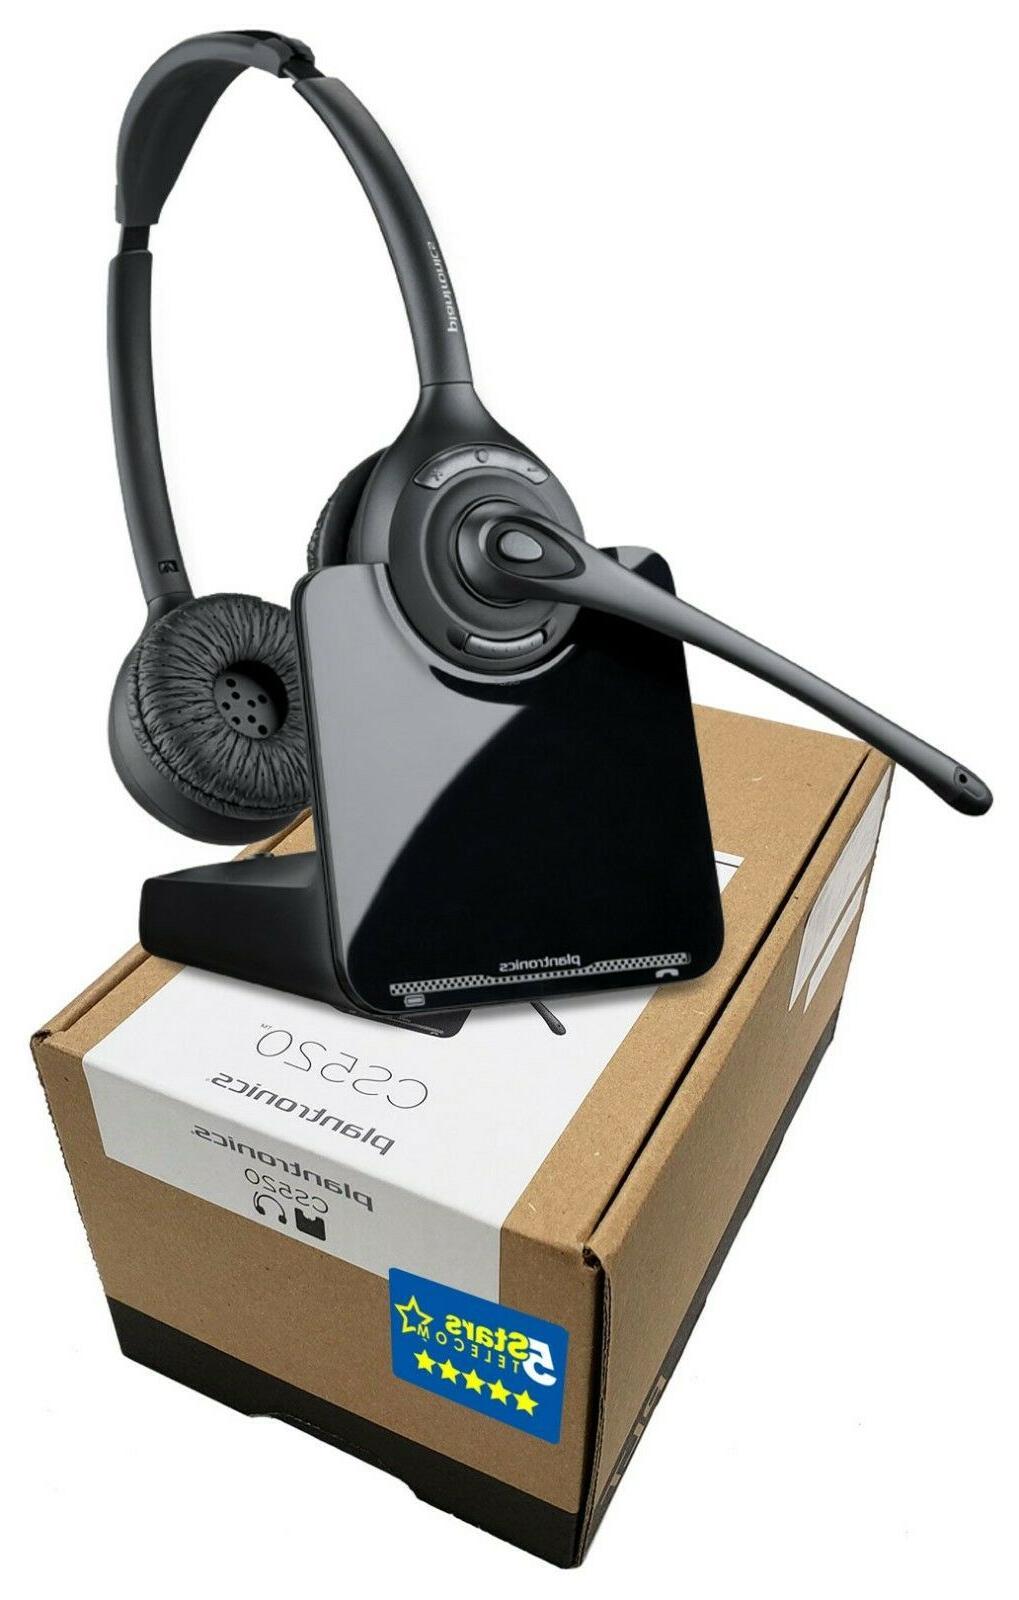 Plantronics 84692-01 Wireless Over-the-Head Binaura